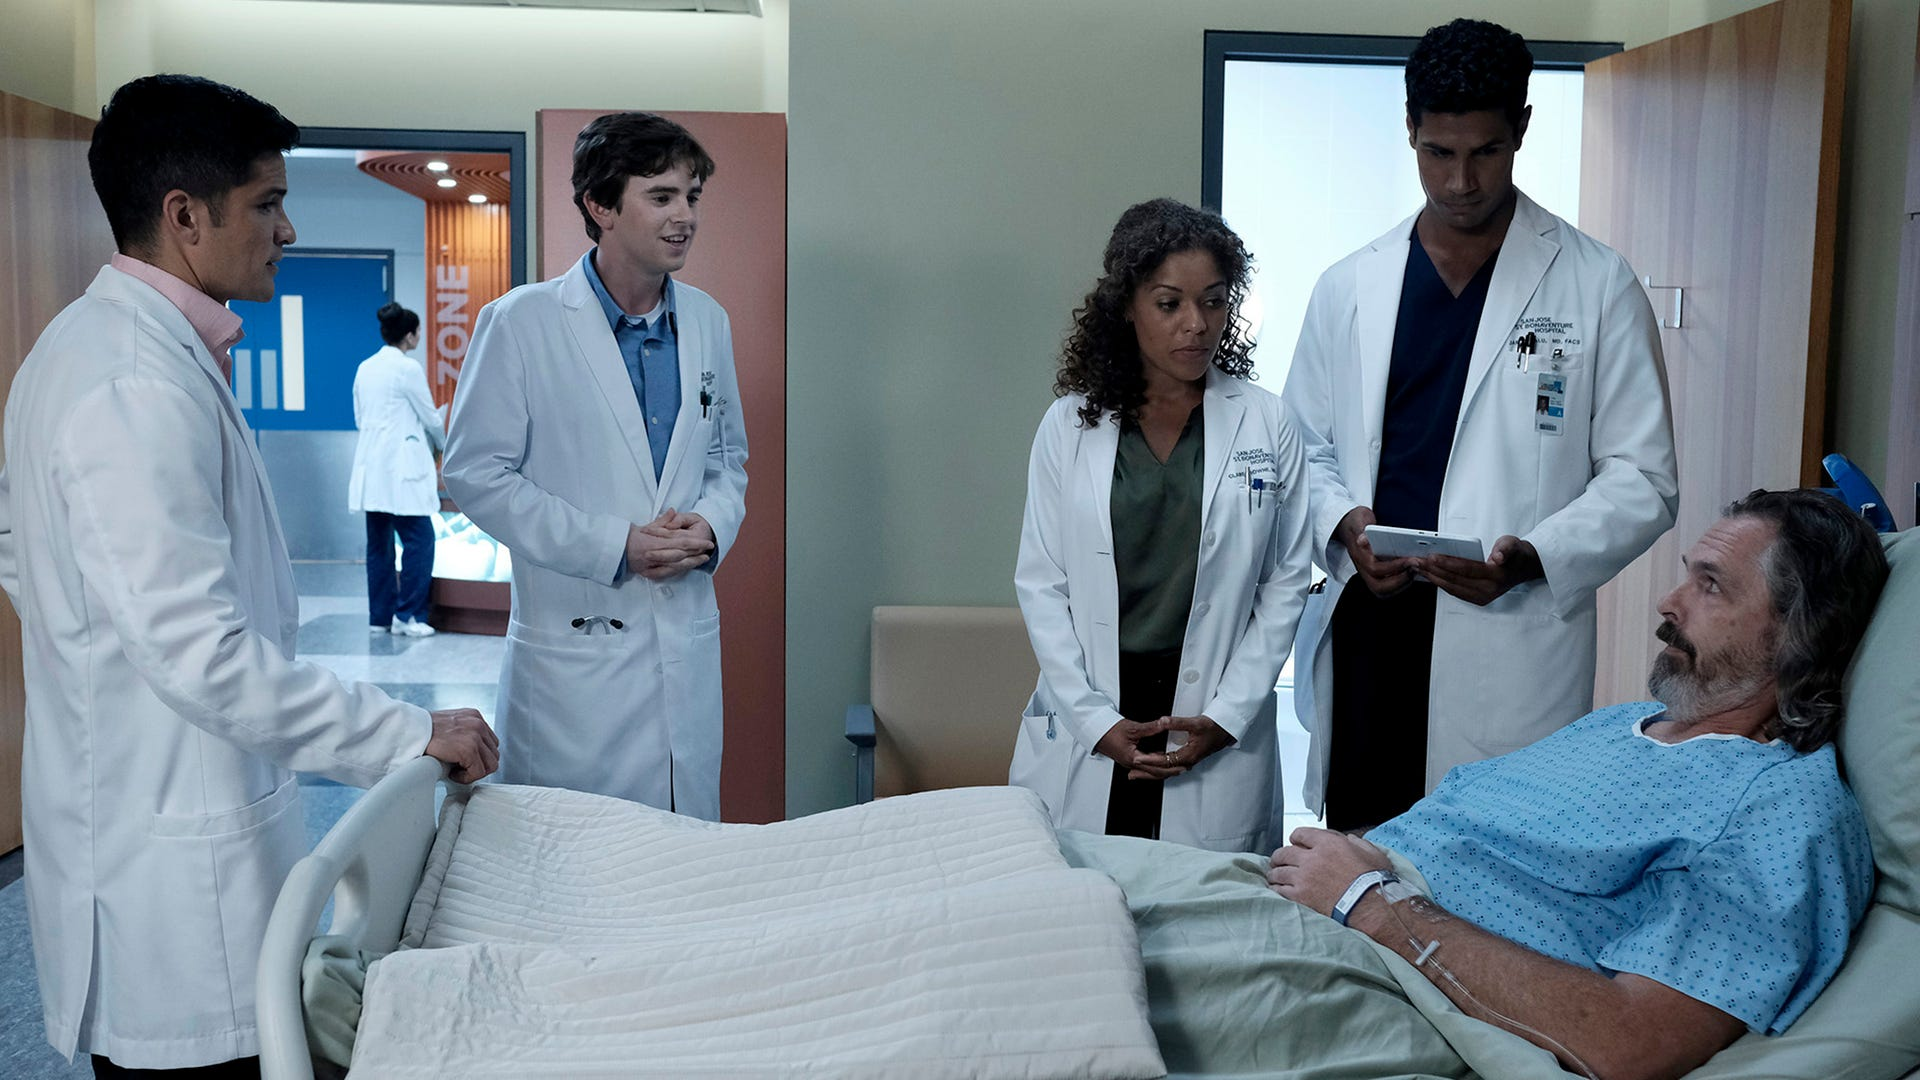 Nicholas Gonzalez, Freddie Highmore, Antonia Thomas, Chuku Modu and Rocky Anderson, The Good Doctor